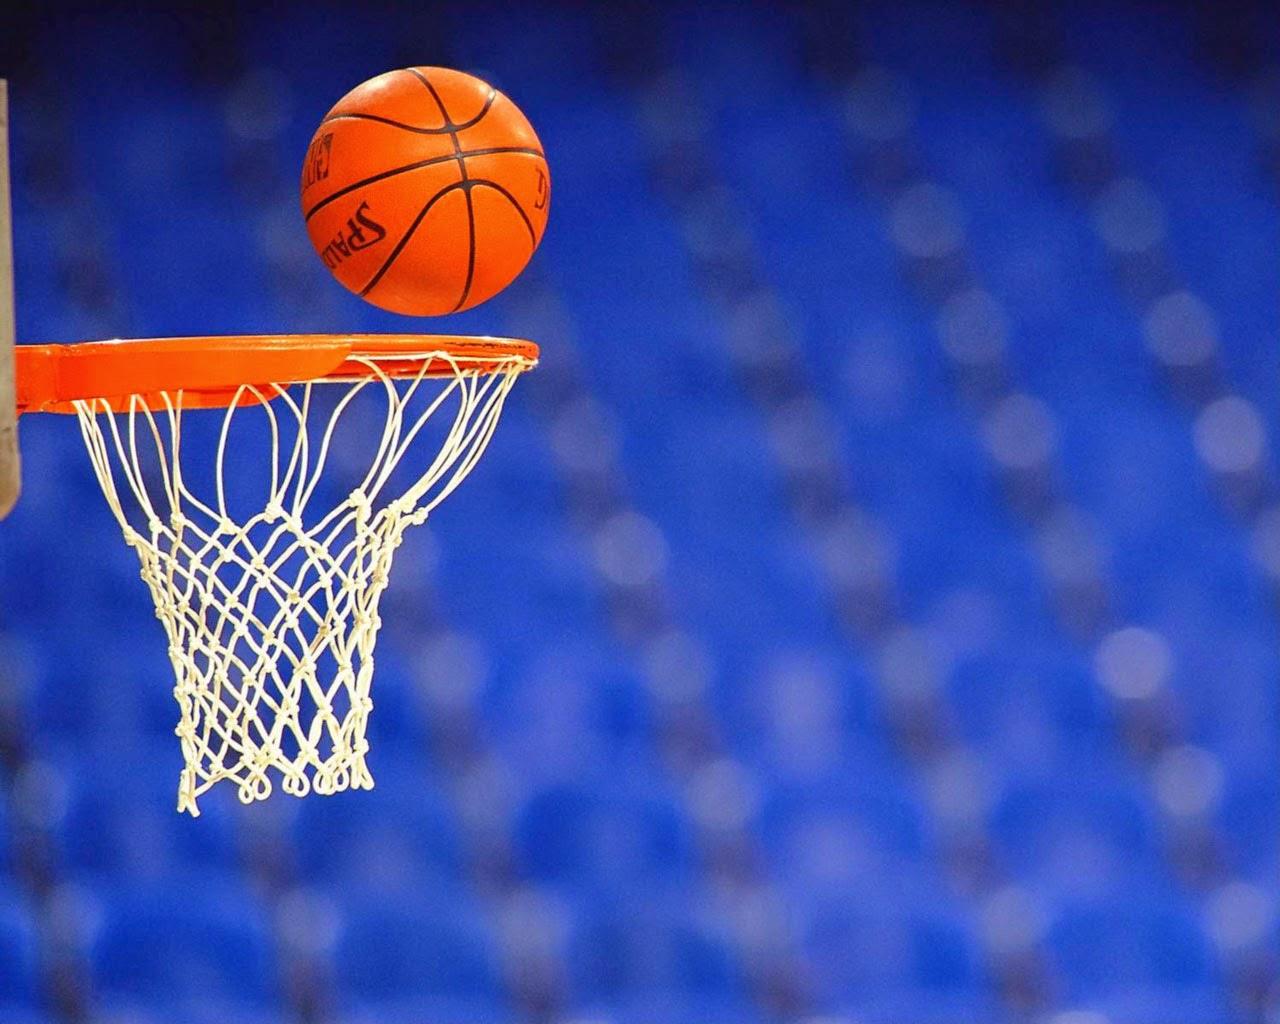 Nba Basketball Wallpaper 1006x1178 Nba Basketball: Basketball Stars Picture: Basketball Nba Wallpaper